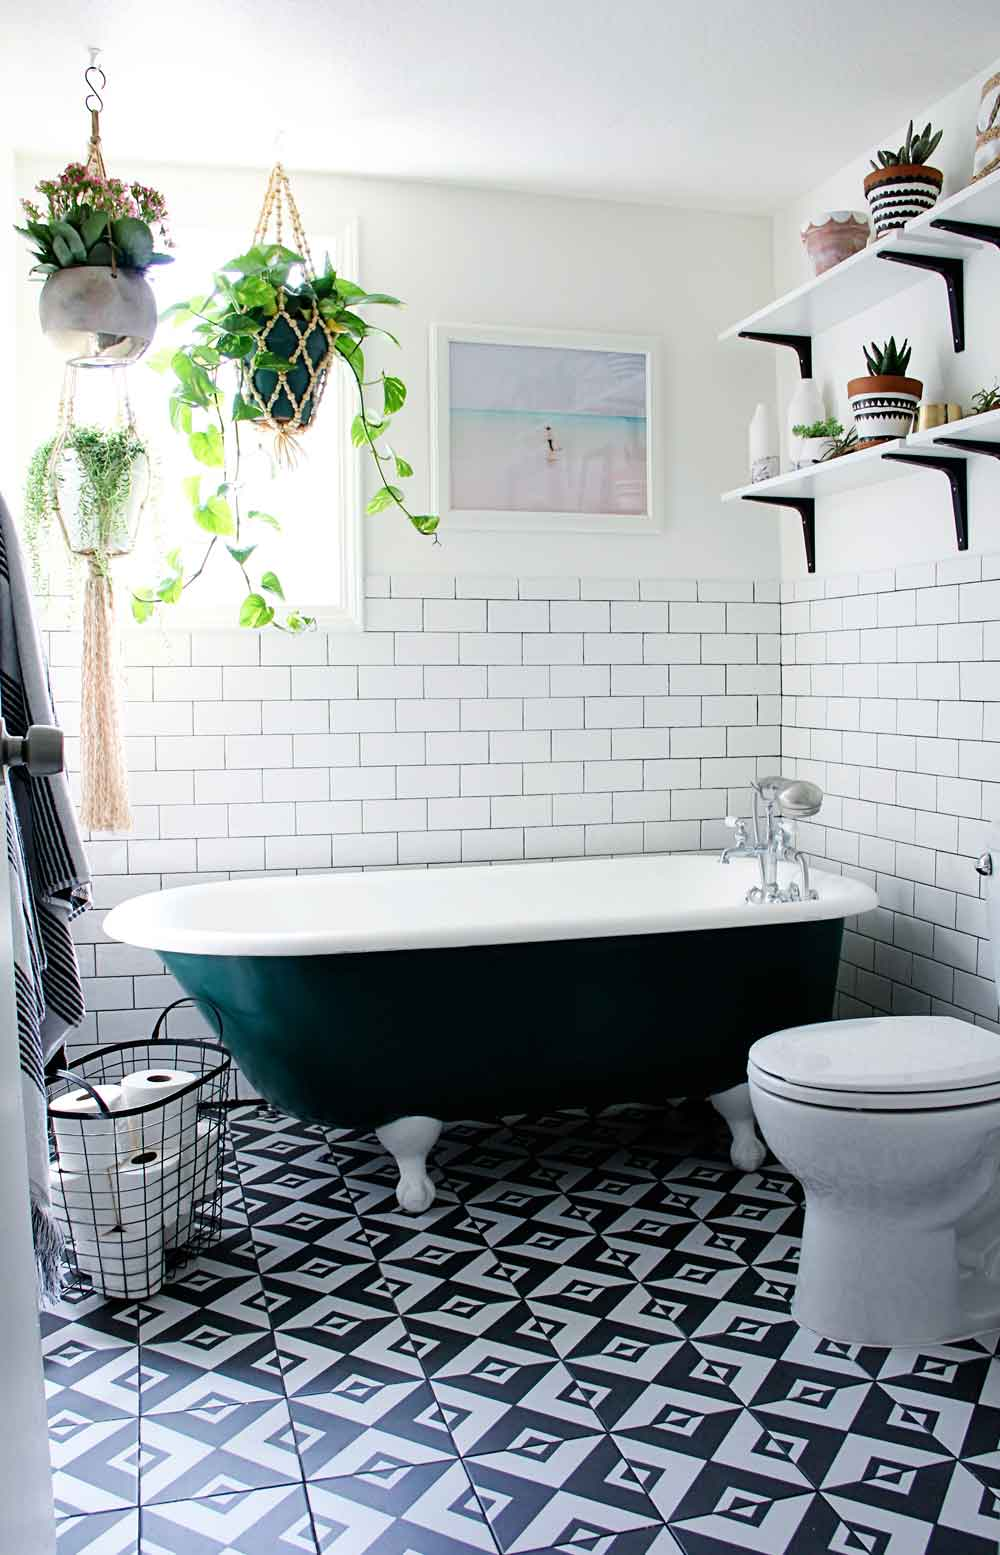 1553973207 590 20 bohemian bathroom ideas - 20 Bohemian Bathroom Ideas